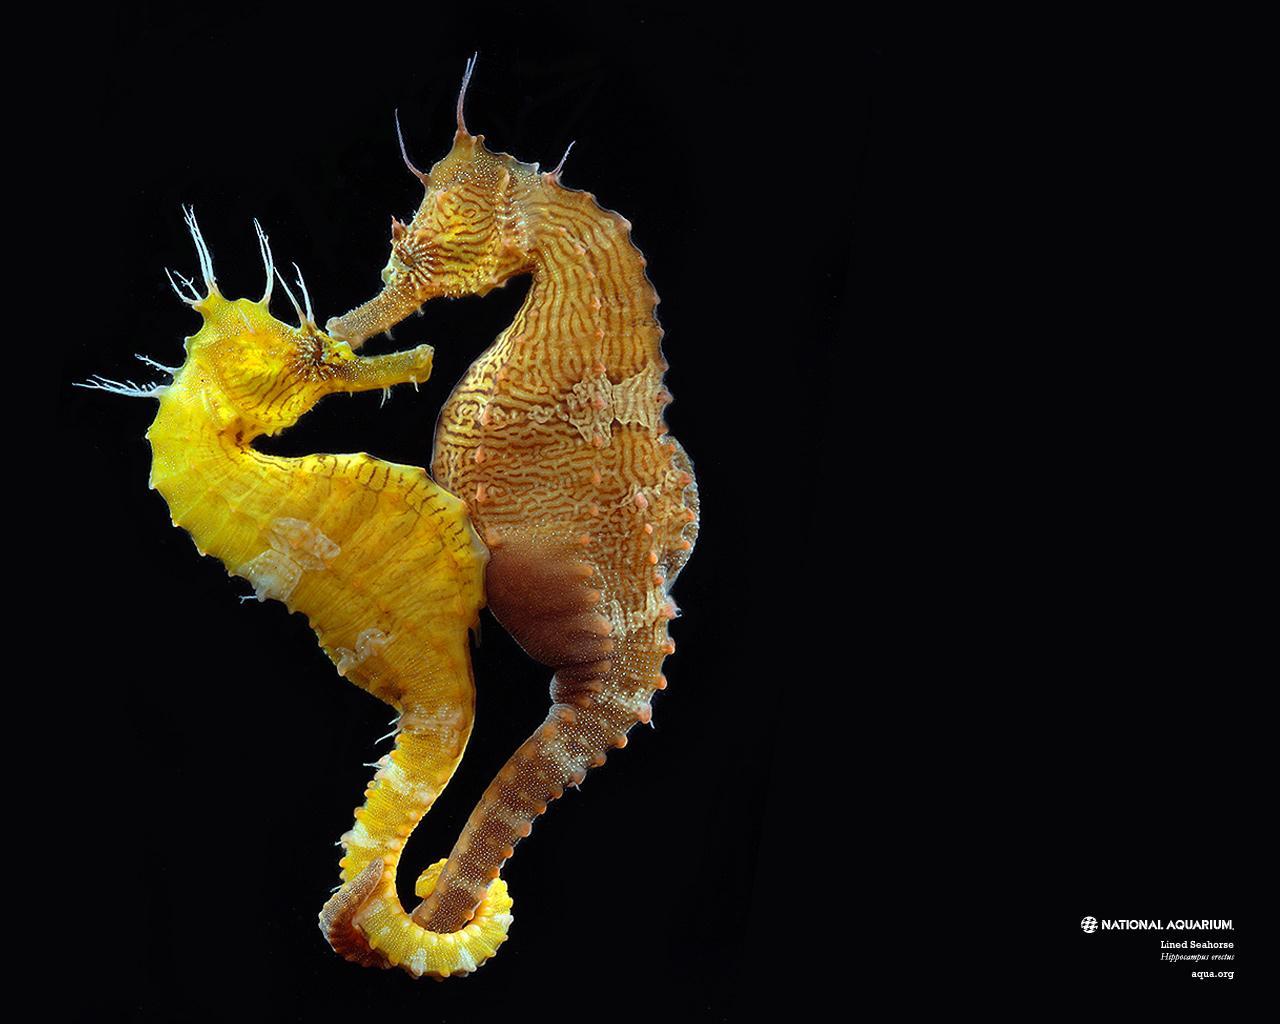 D nyan n en lgin hayvanlar ndan denizat hakk nda for Immagini di cavalluccio marino